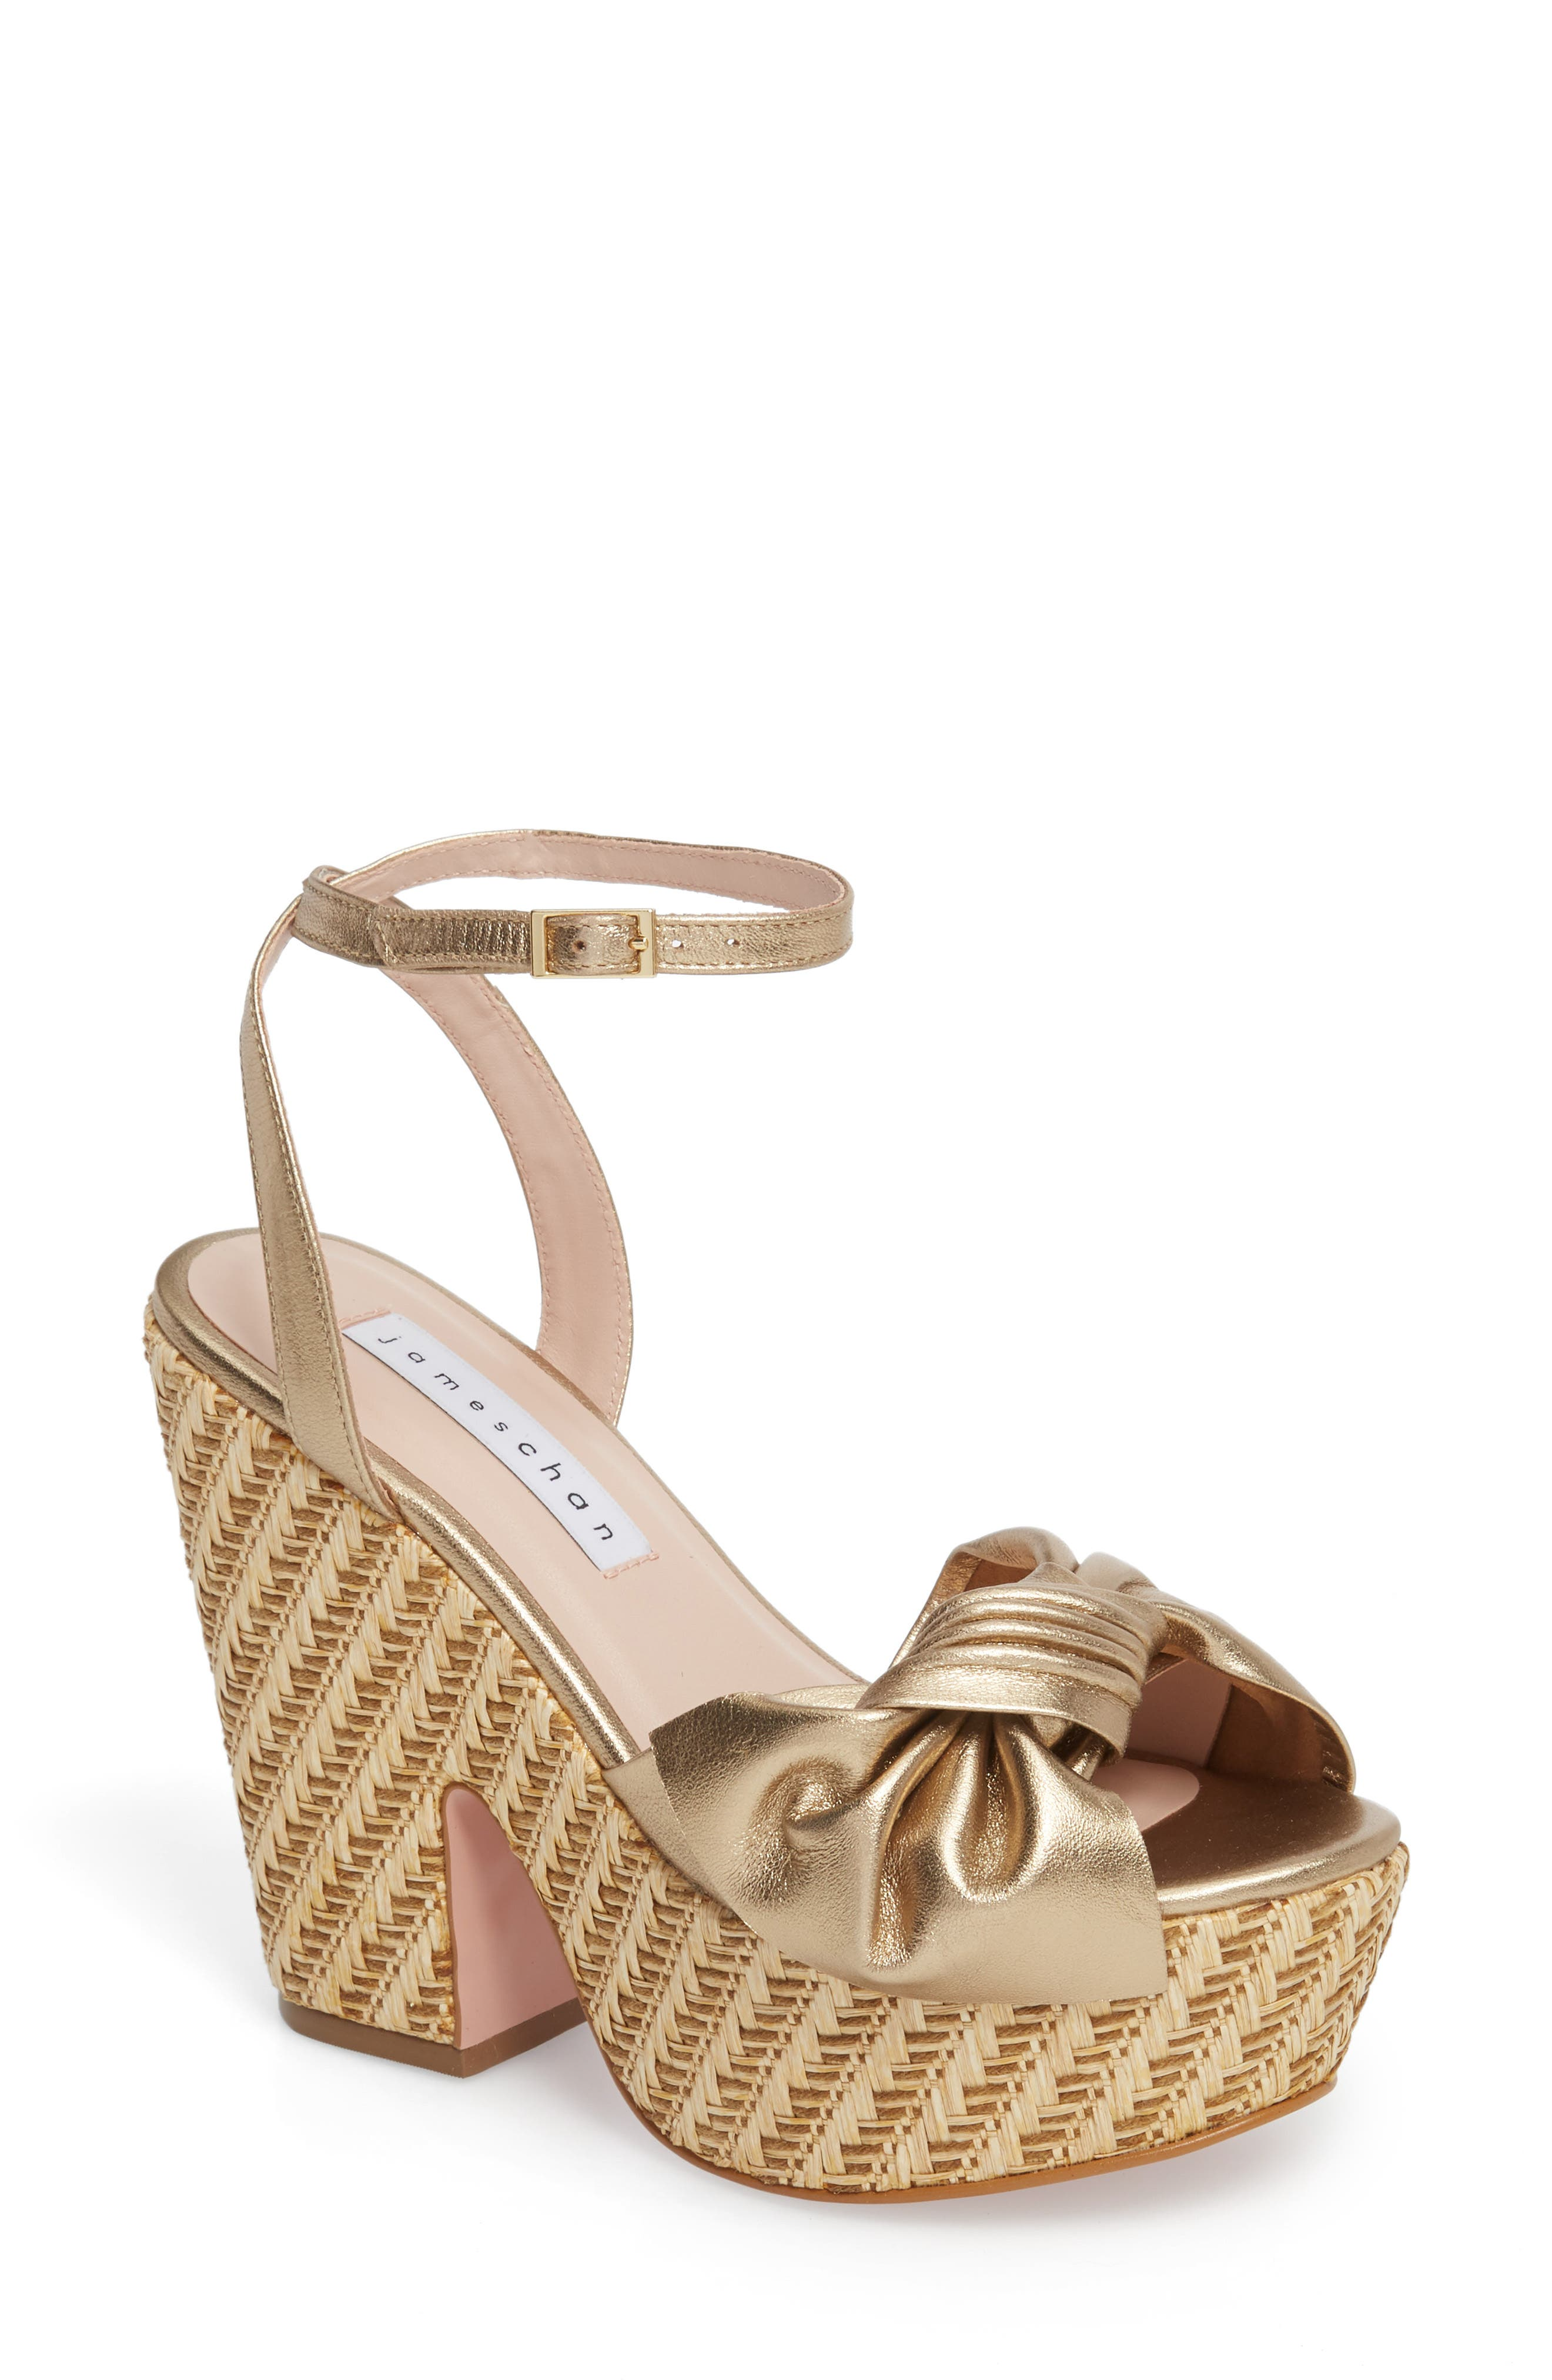 Pinky Platform Sandal,                             Main thumbnail 1, color,                             Dark Gold Suede